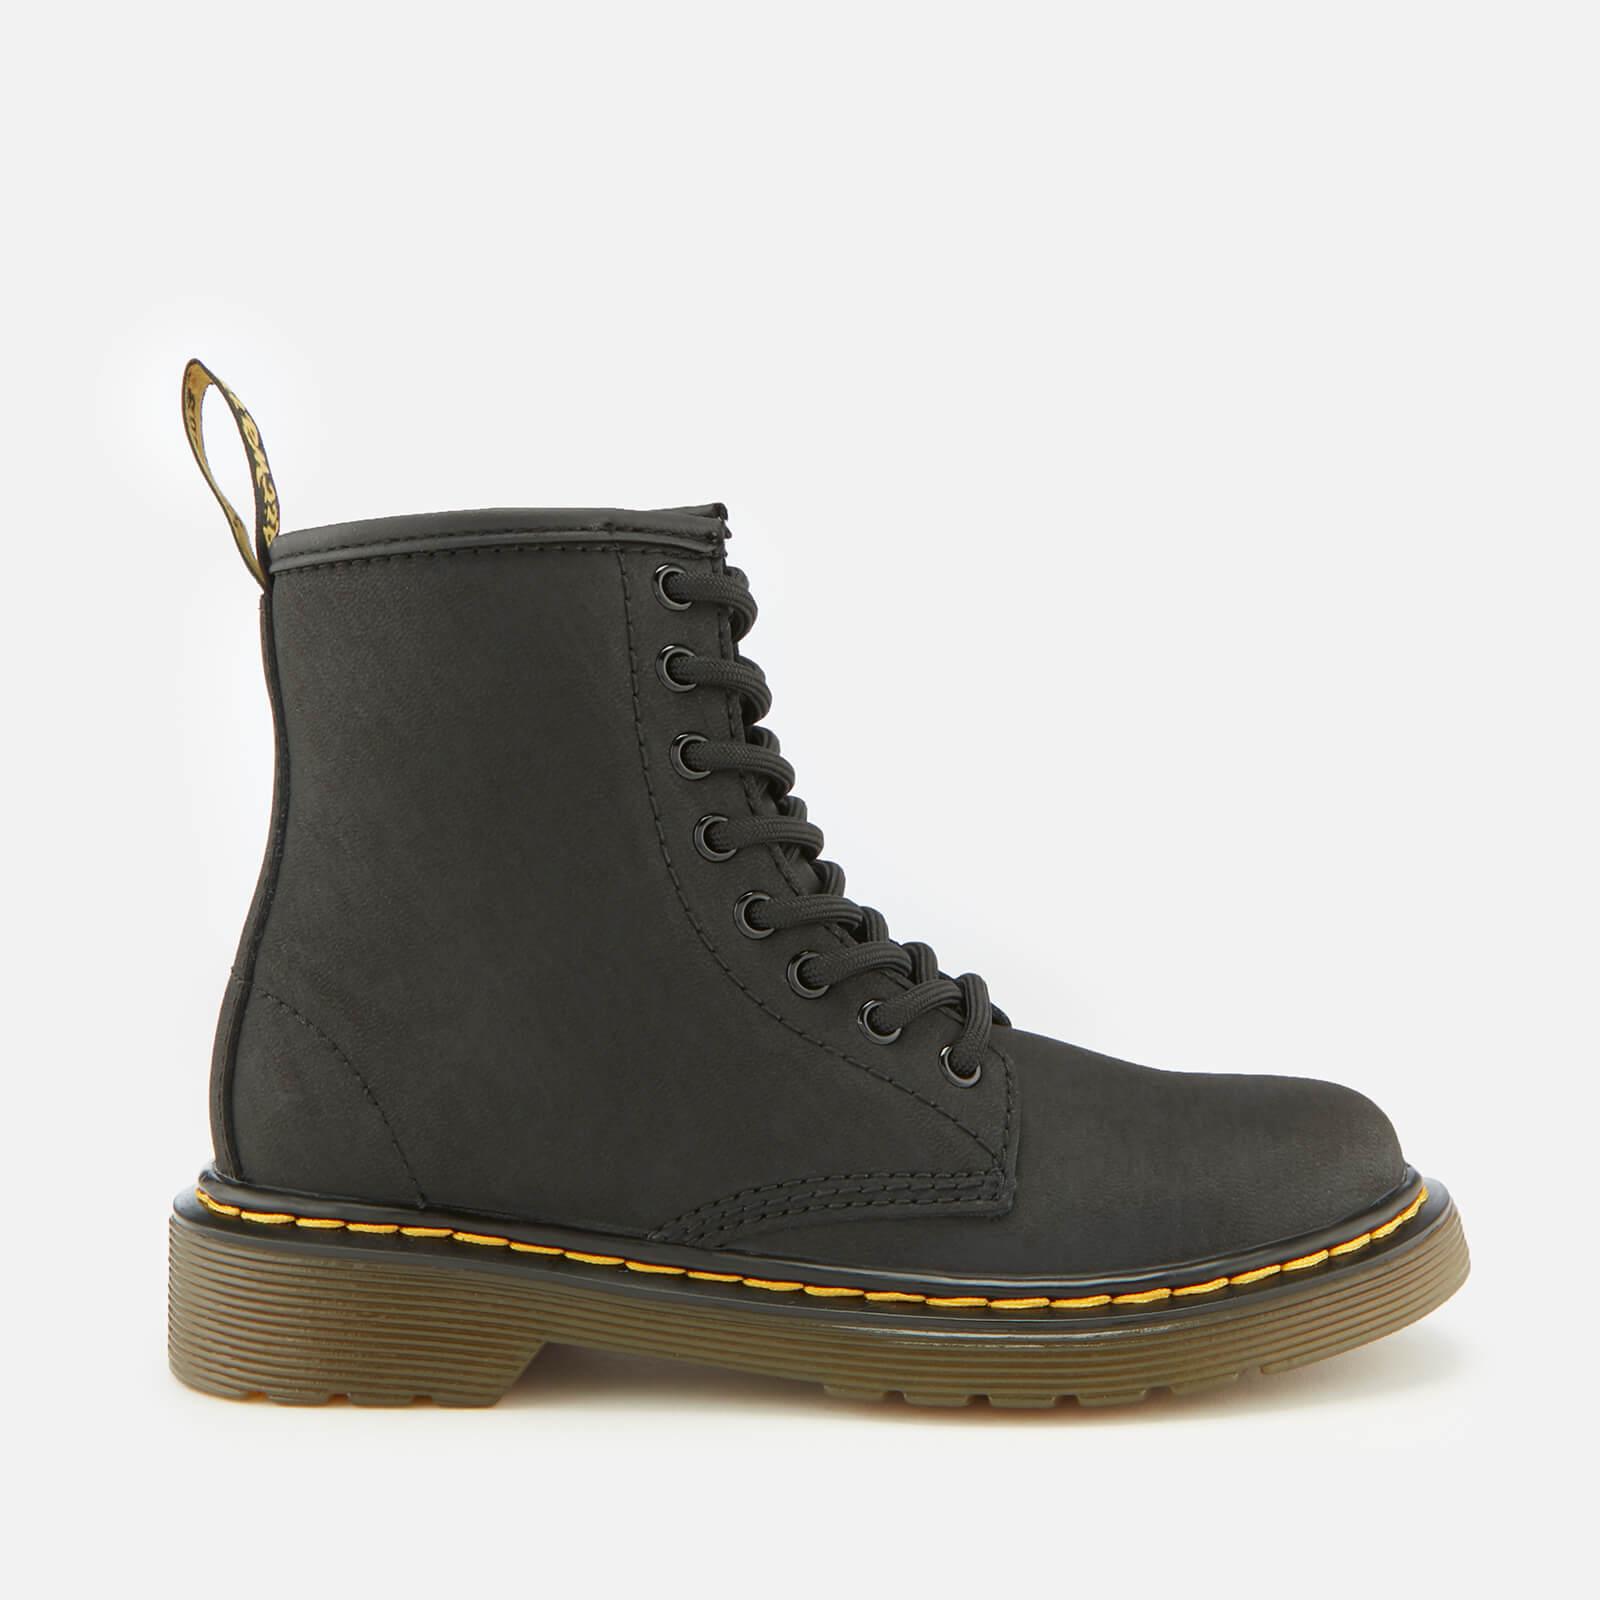 d934d87e674 Dr. Martens Kid's 1460 Serena Warm Lining Lace-Up Boots - Black Junior  Clothing   TheHut.com